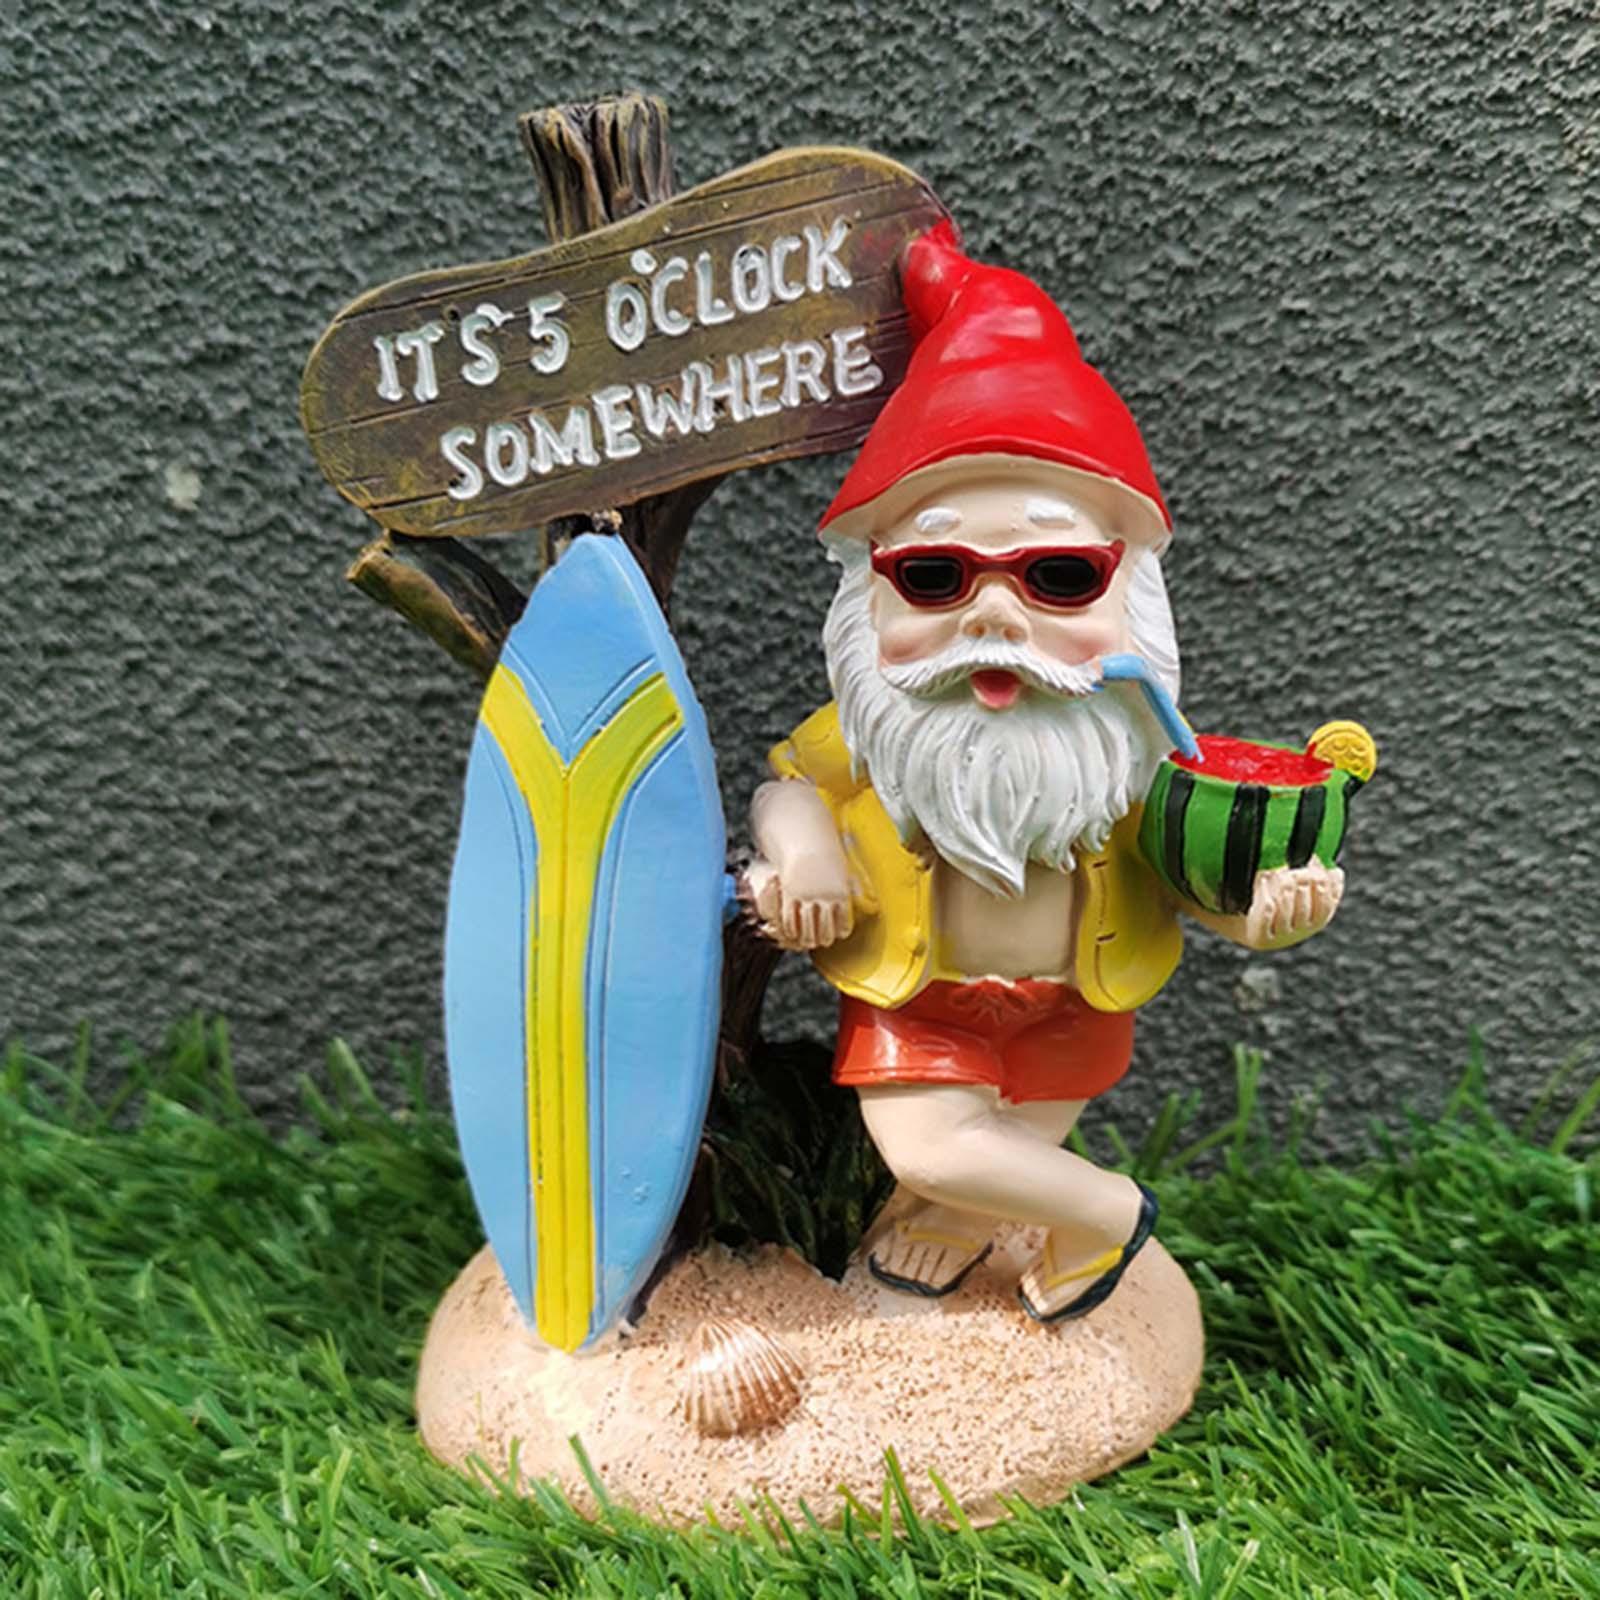 thumbnail 12 - Funny Resin Naughty Garden Gnome Statue Ornaments Outdoor Villa Home Figurines